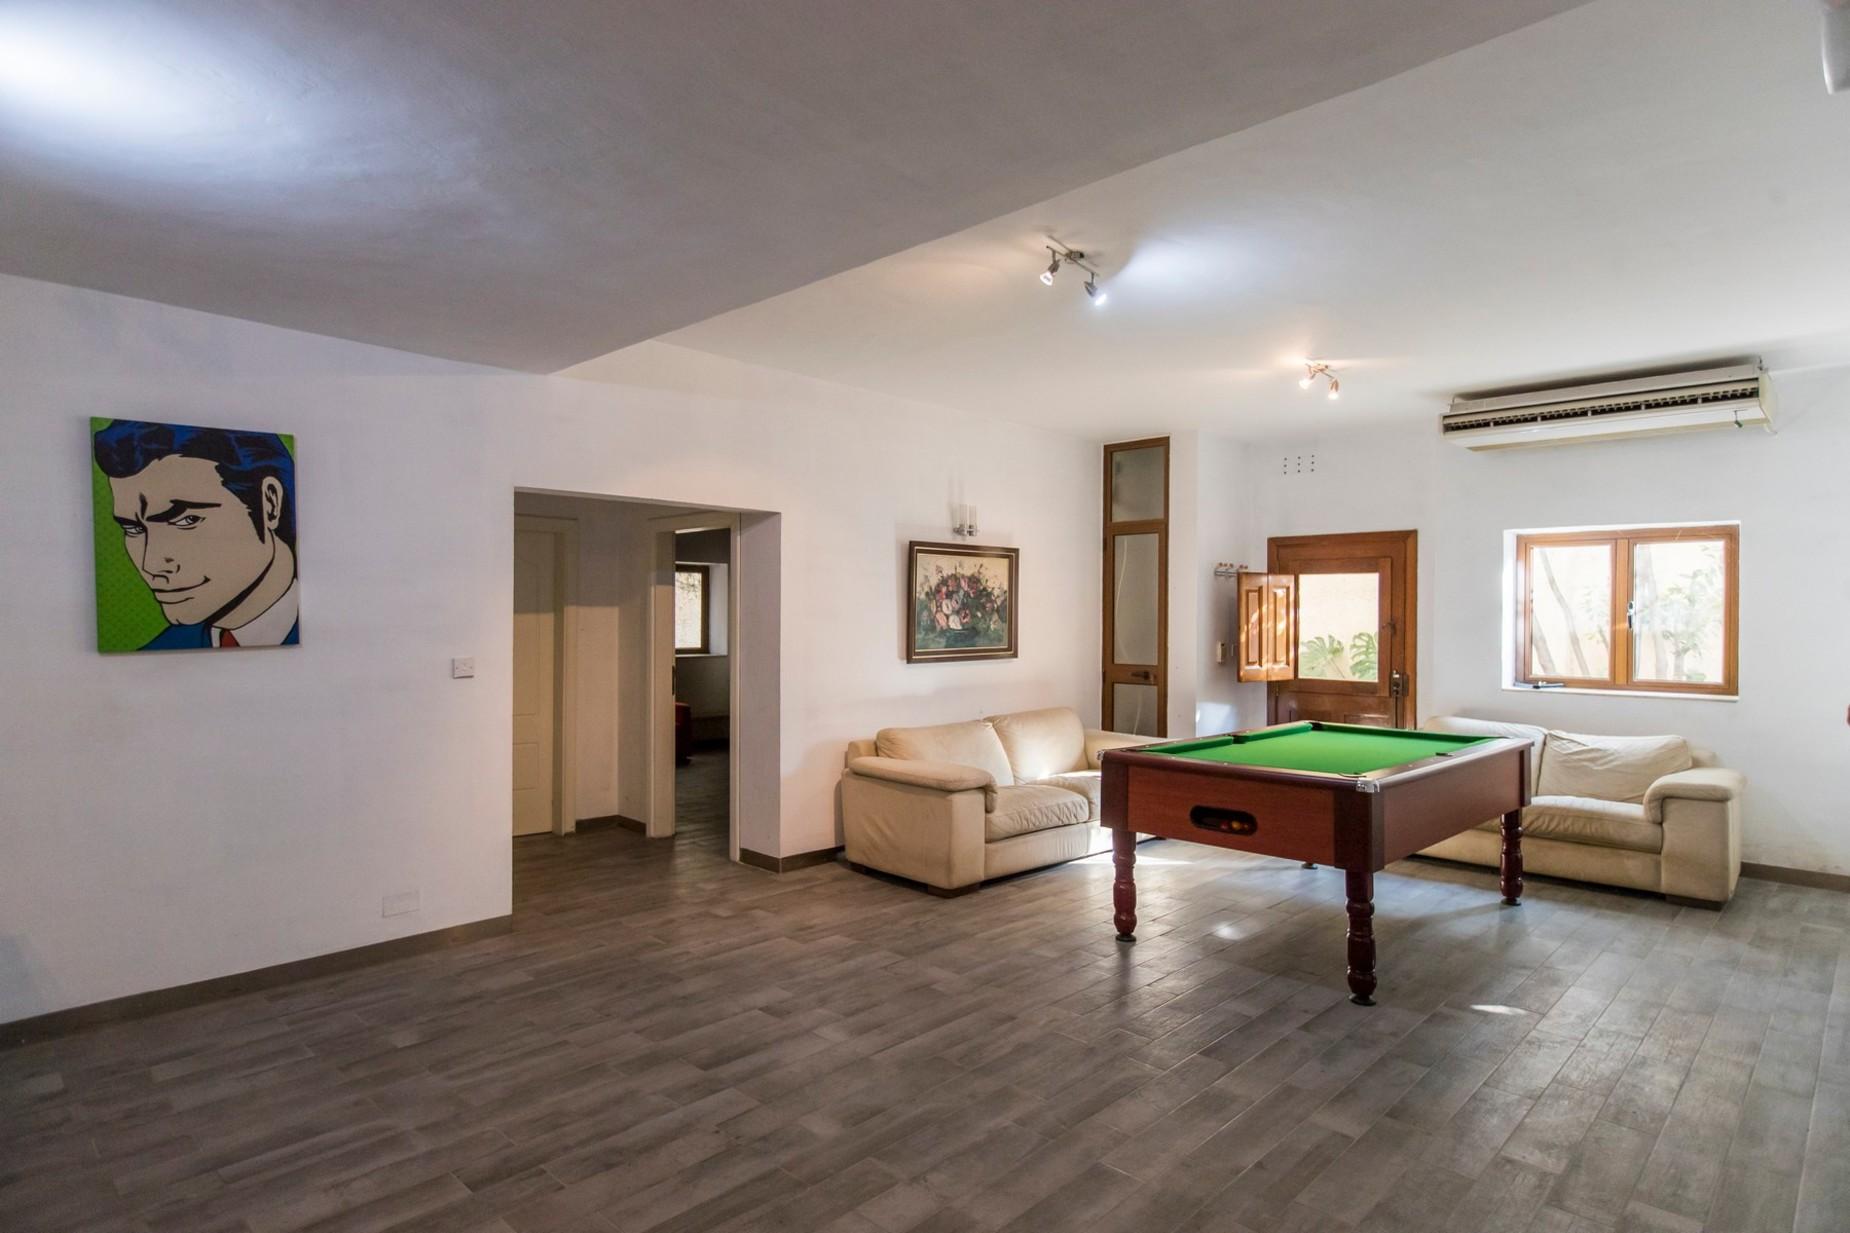 4 bed Villa For Rent in Naxxar, Naxxar - thumb 16